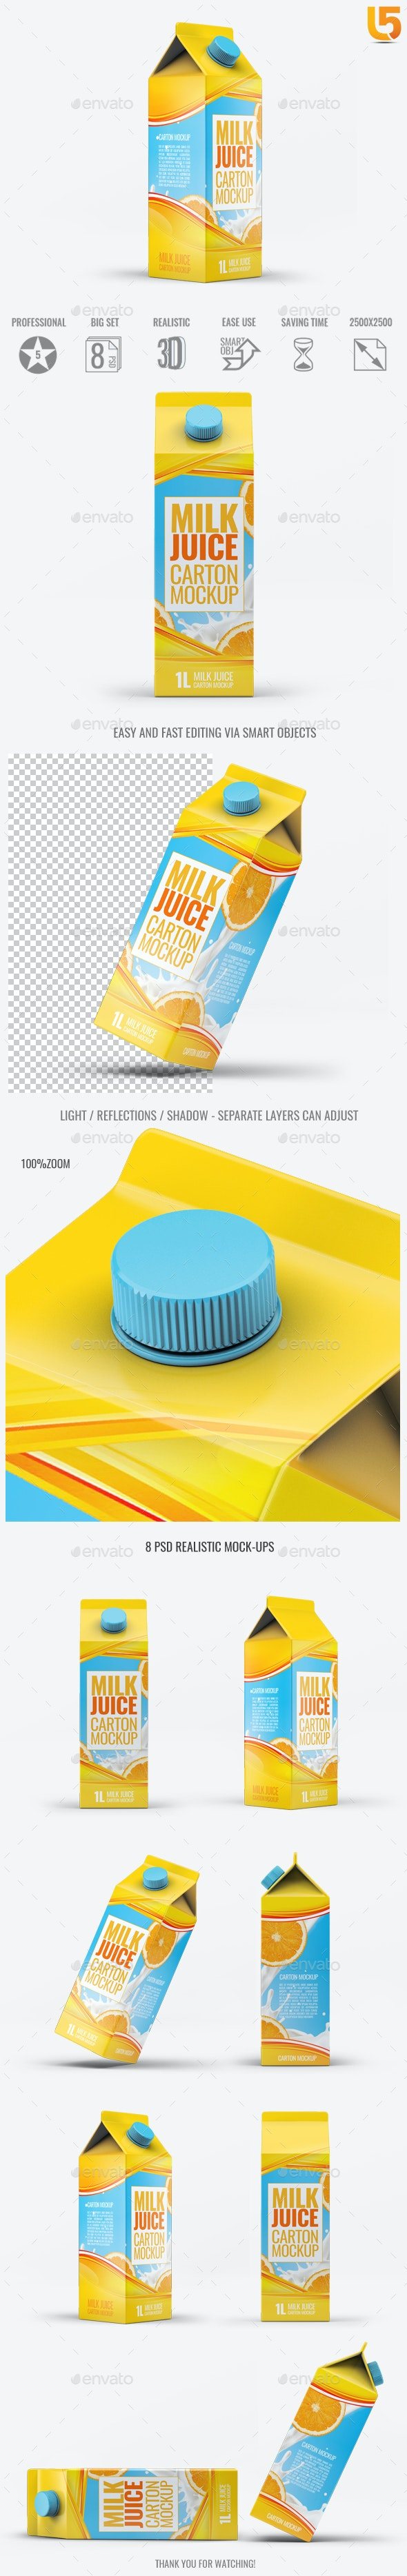 Milk or Juice Carton Mock-Up v.3 - Food and Drink Packaging